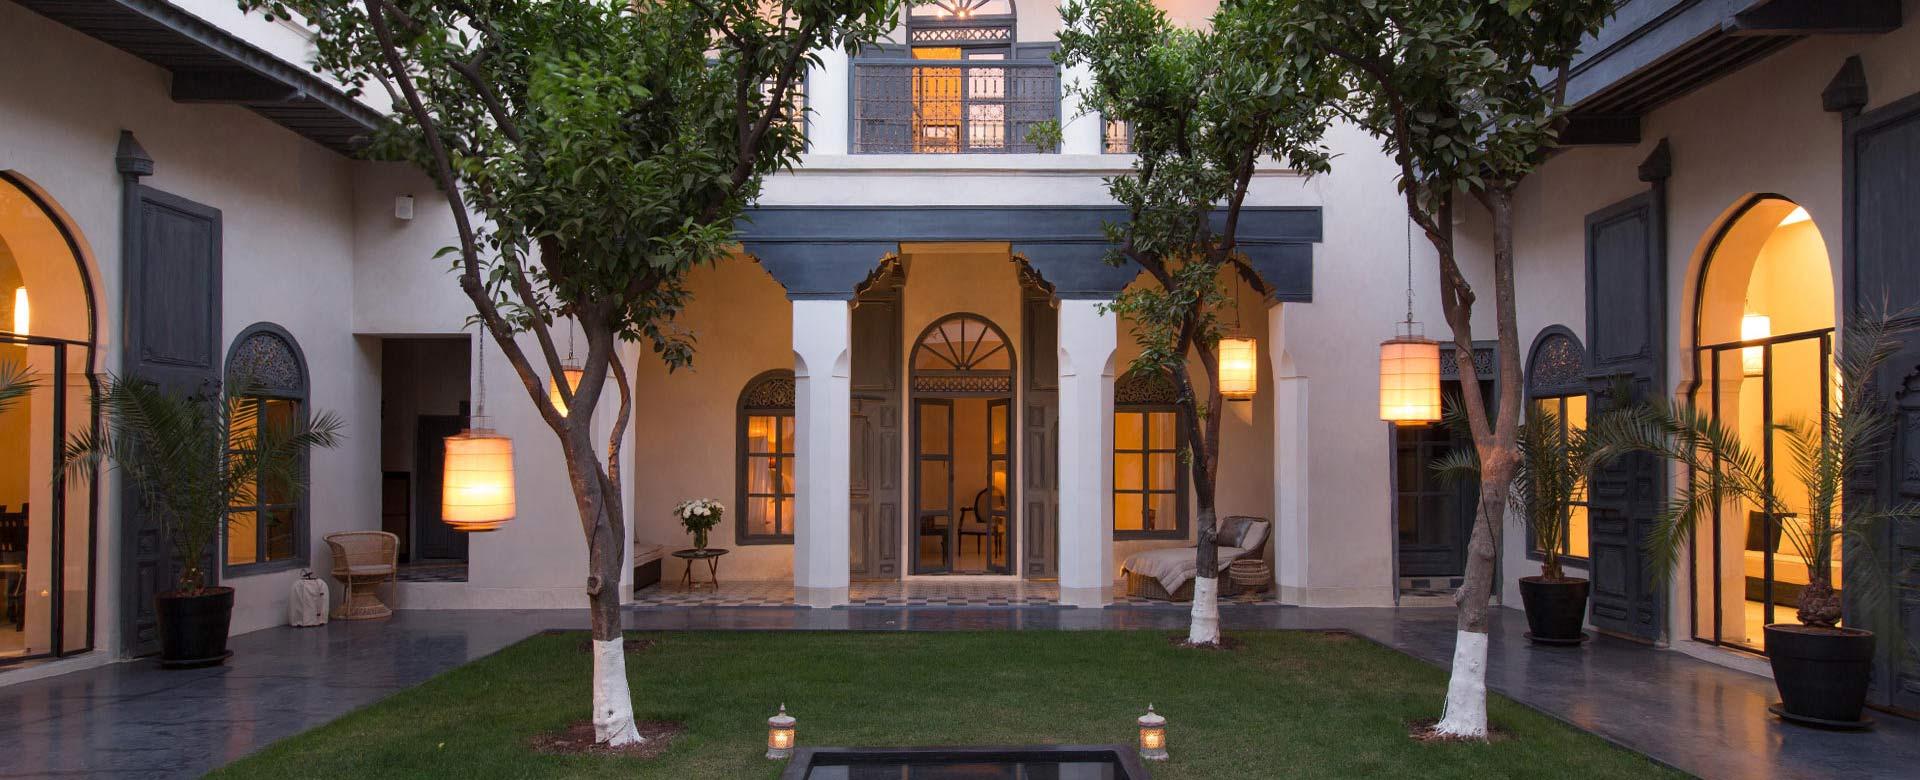 Luxury riad rentals in morocco for Luxury riad in marrakech